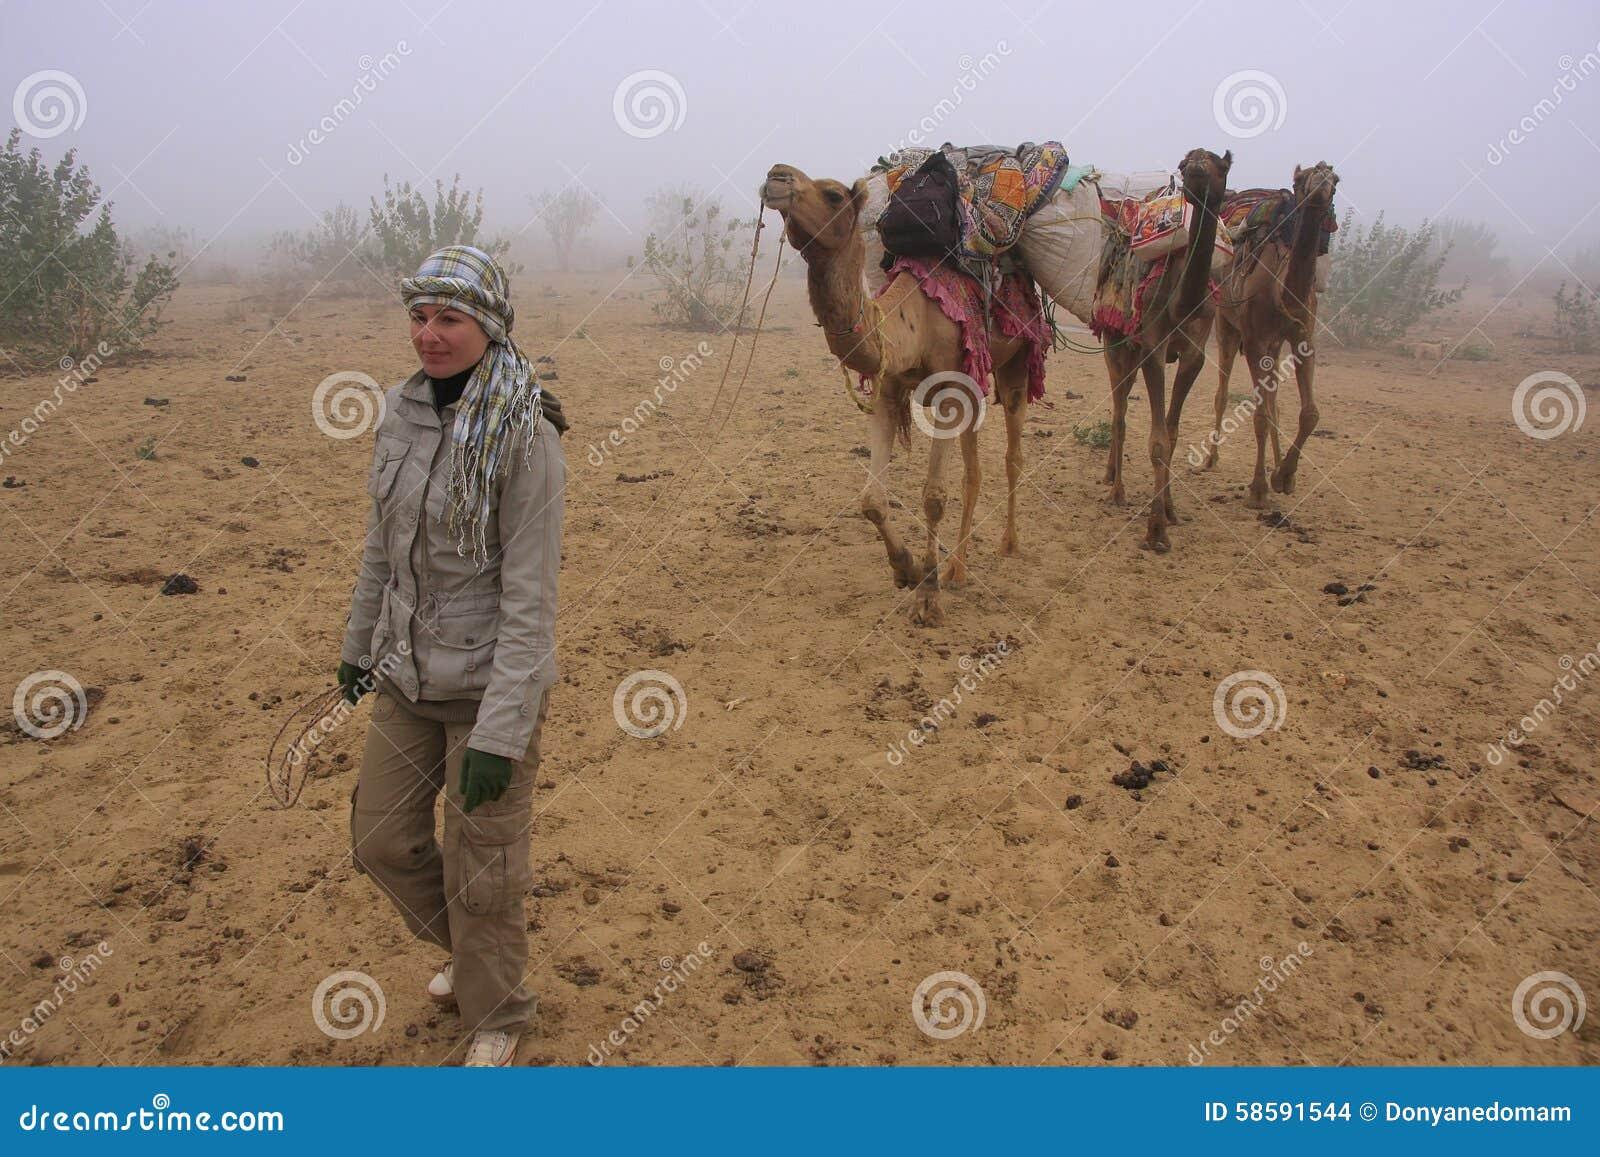 namib desert boundaries in dating